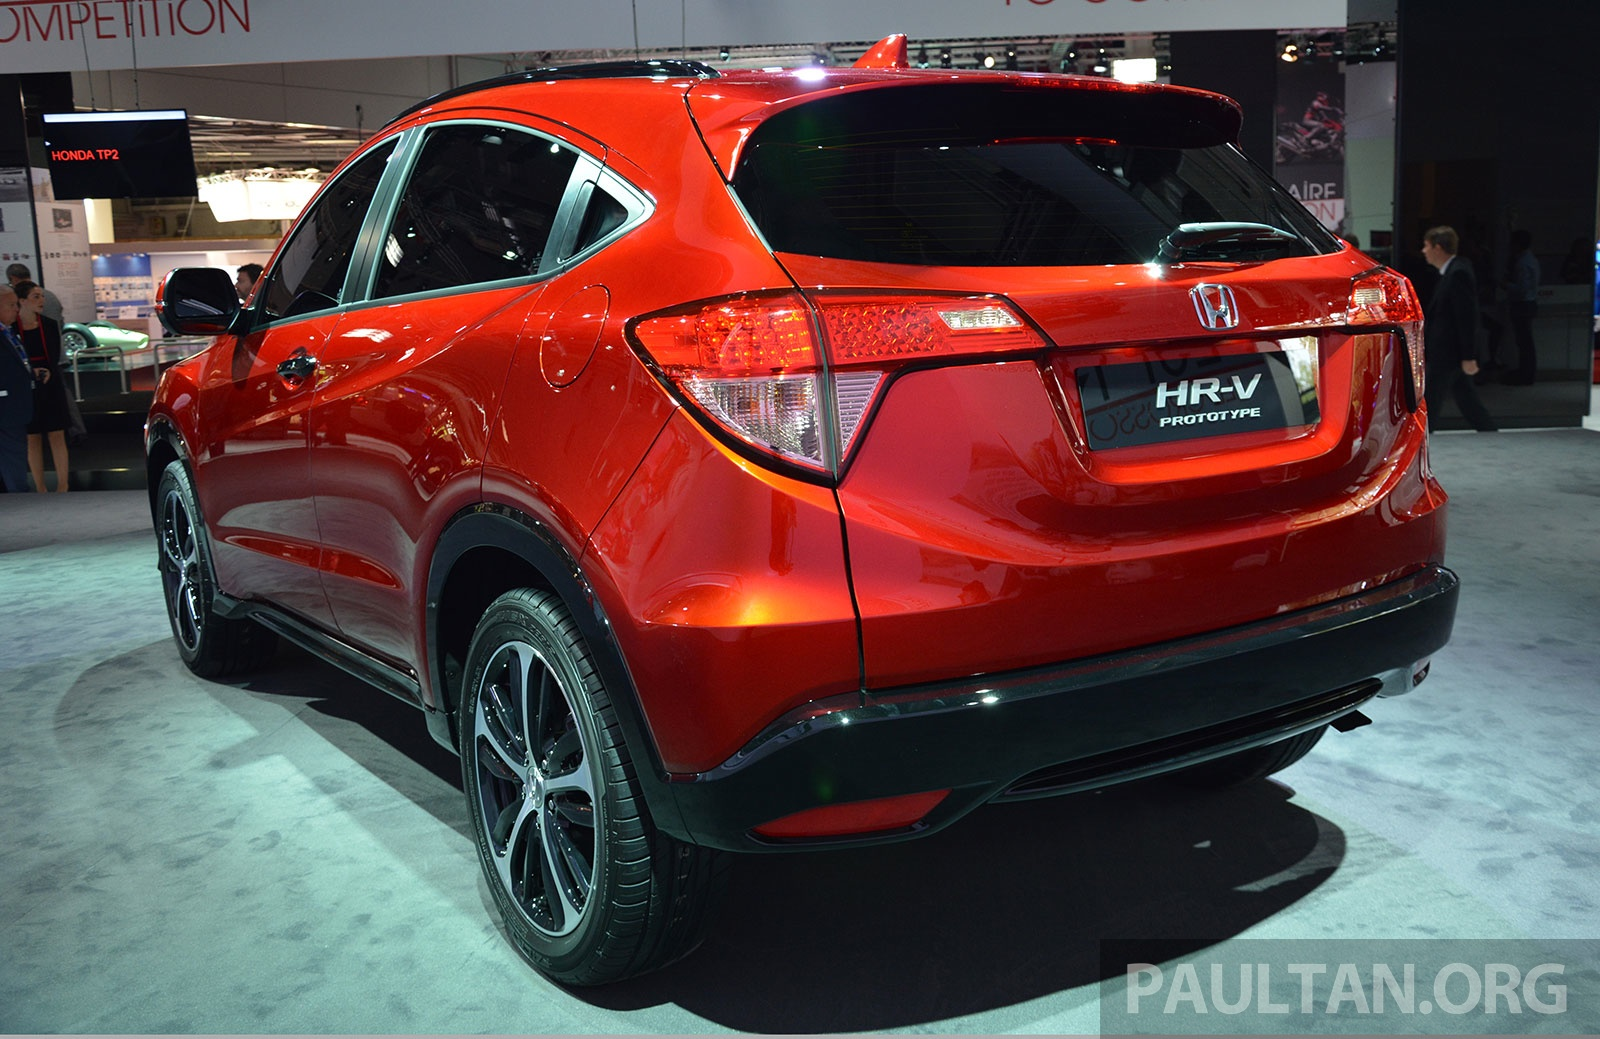 Honda Hr V 2018 >> Paris 2014: European Honda HR-V looking good in red Paul Tan - Image 277905